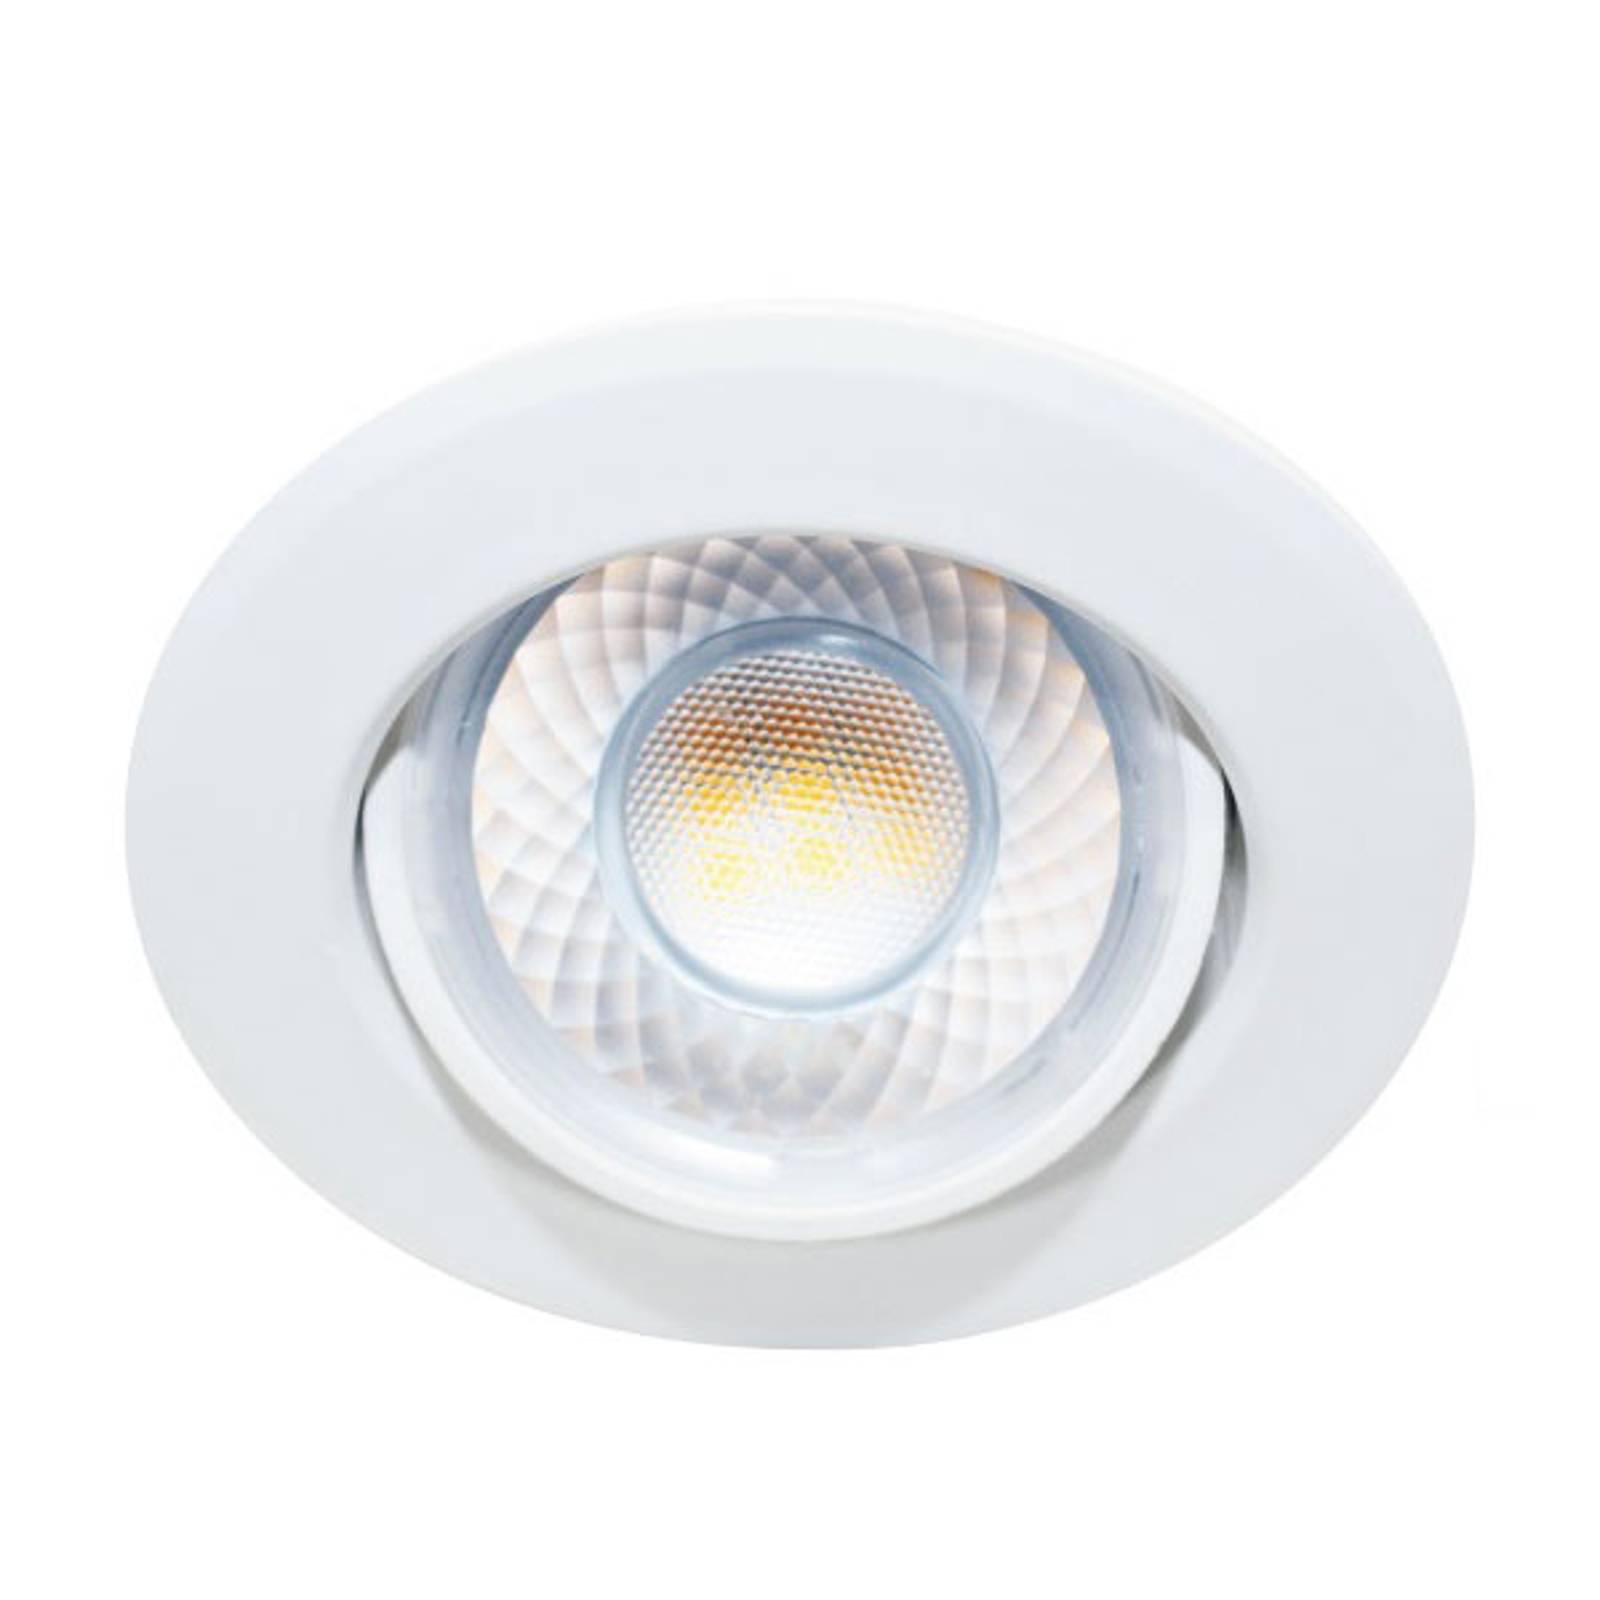 Dekto LED-spot 7,8 cm 38° 8 W Ra90 2.700 K